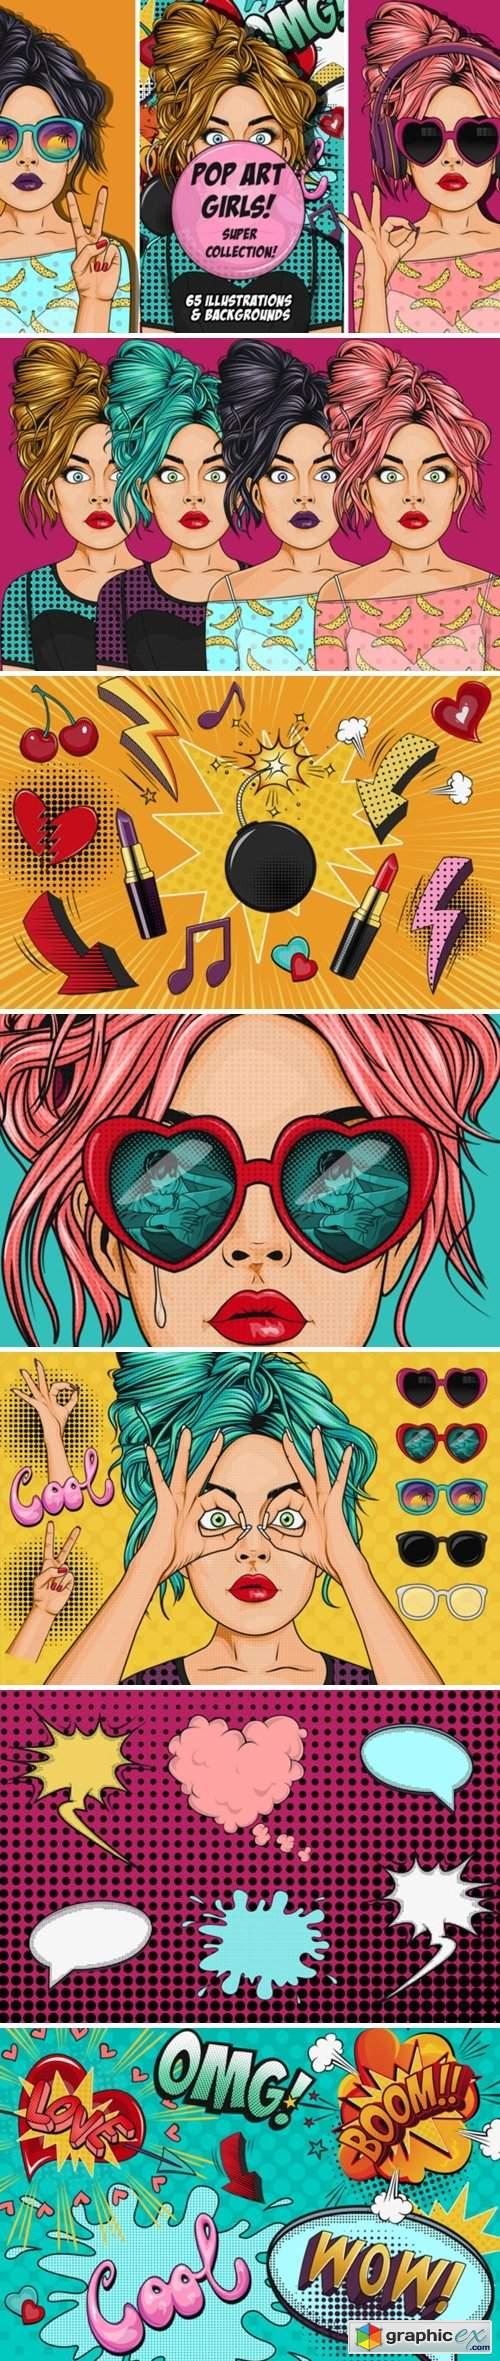 Comic Style Pop Art Girls